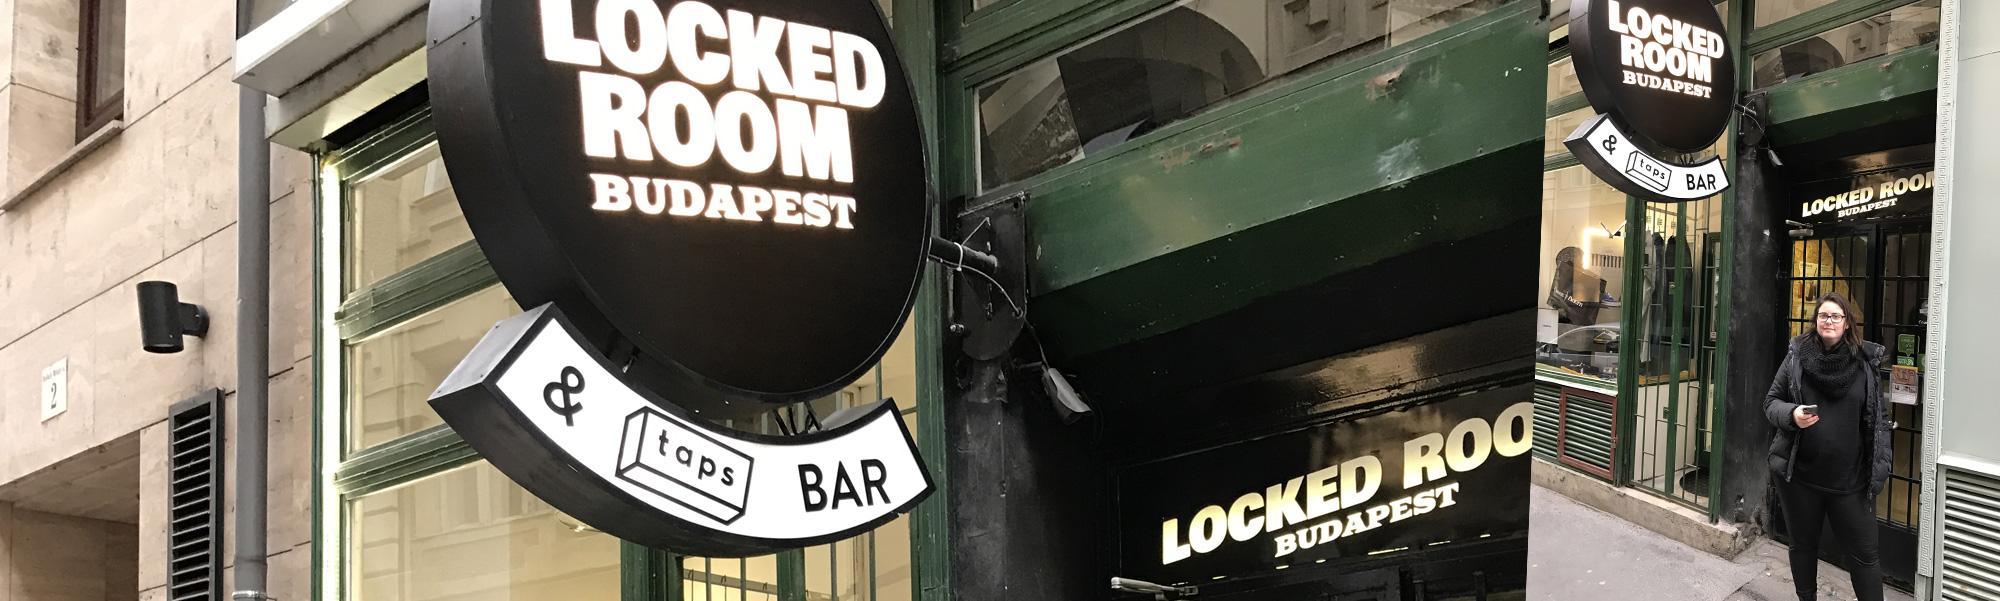 Locked Budapest